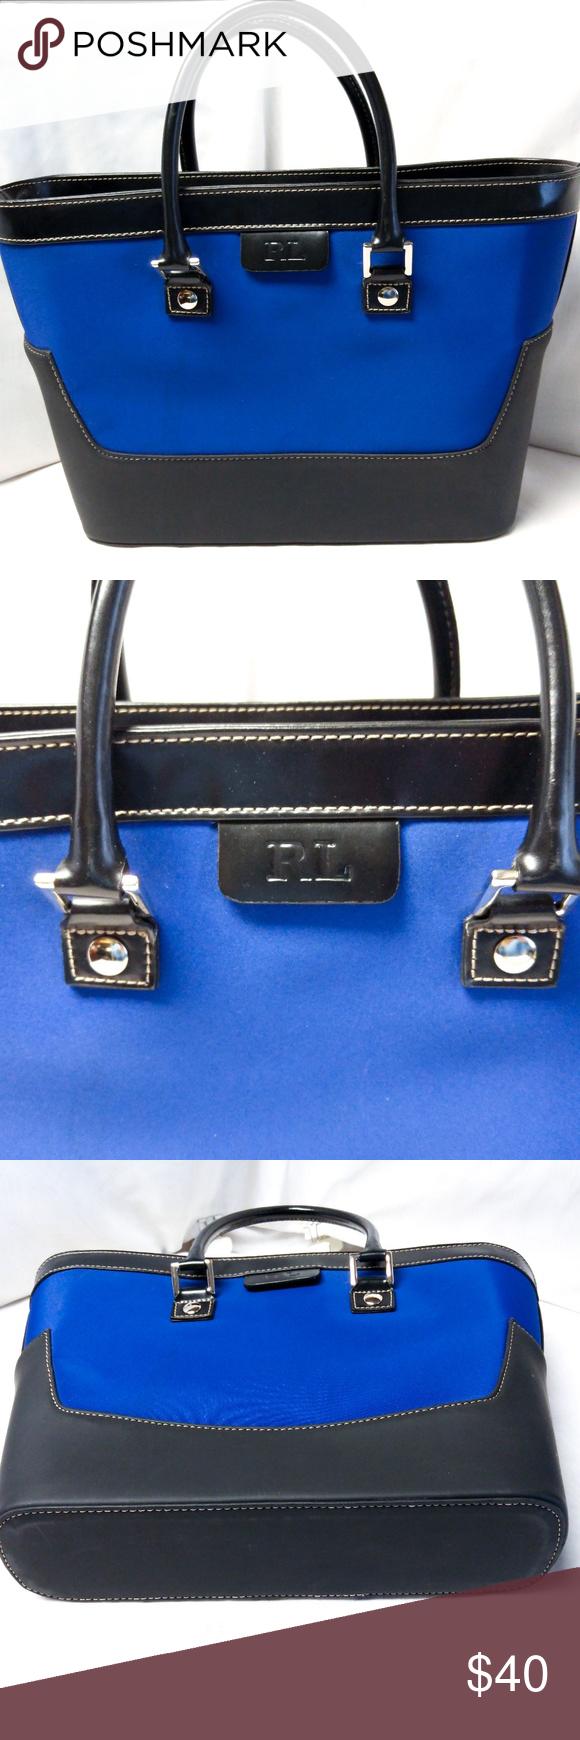 a3fb276ace83 Ralph Lauren Satchel Handbag Tote Pacific Blue Ralph Lauren Satchel Handbag  Purse Tote Pacific Blue Black